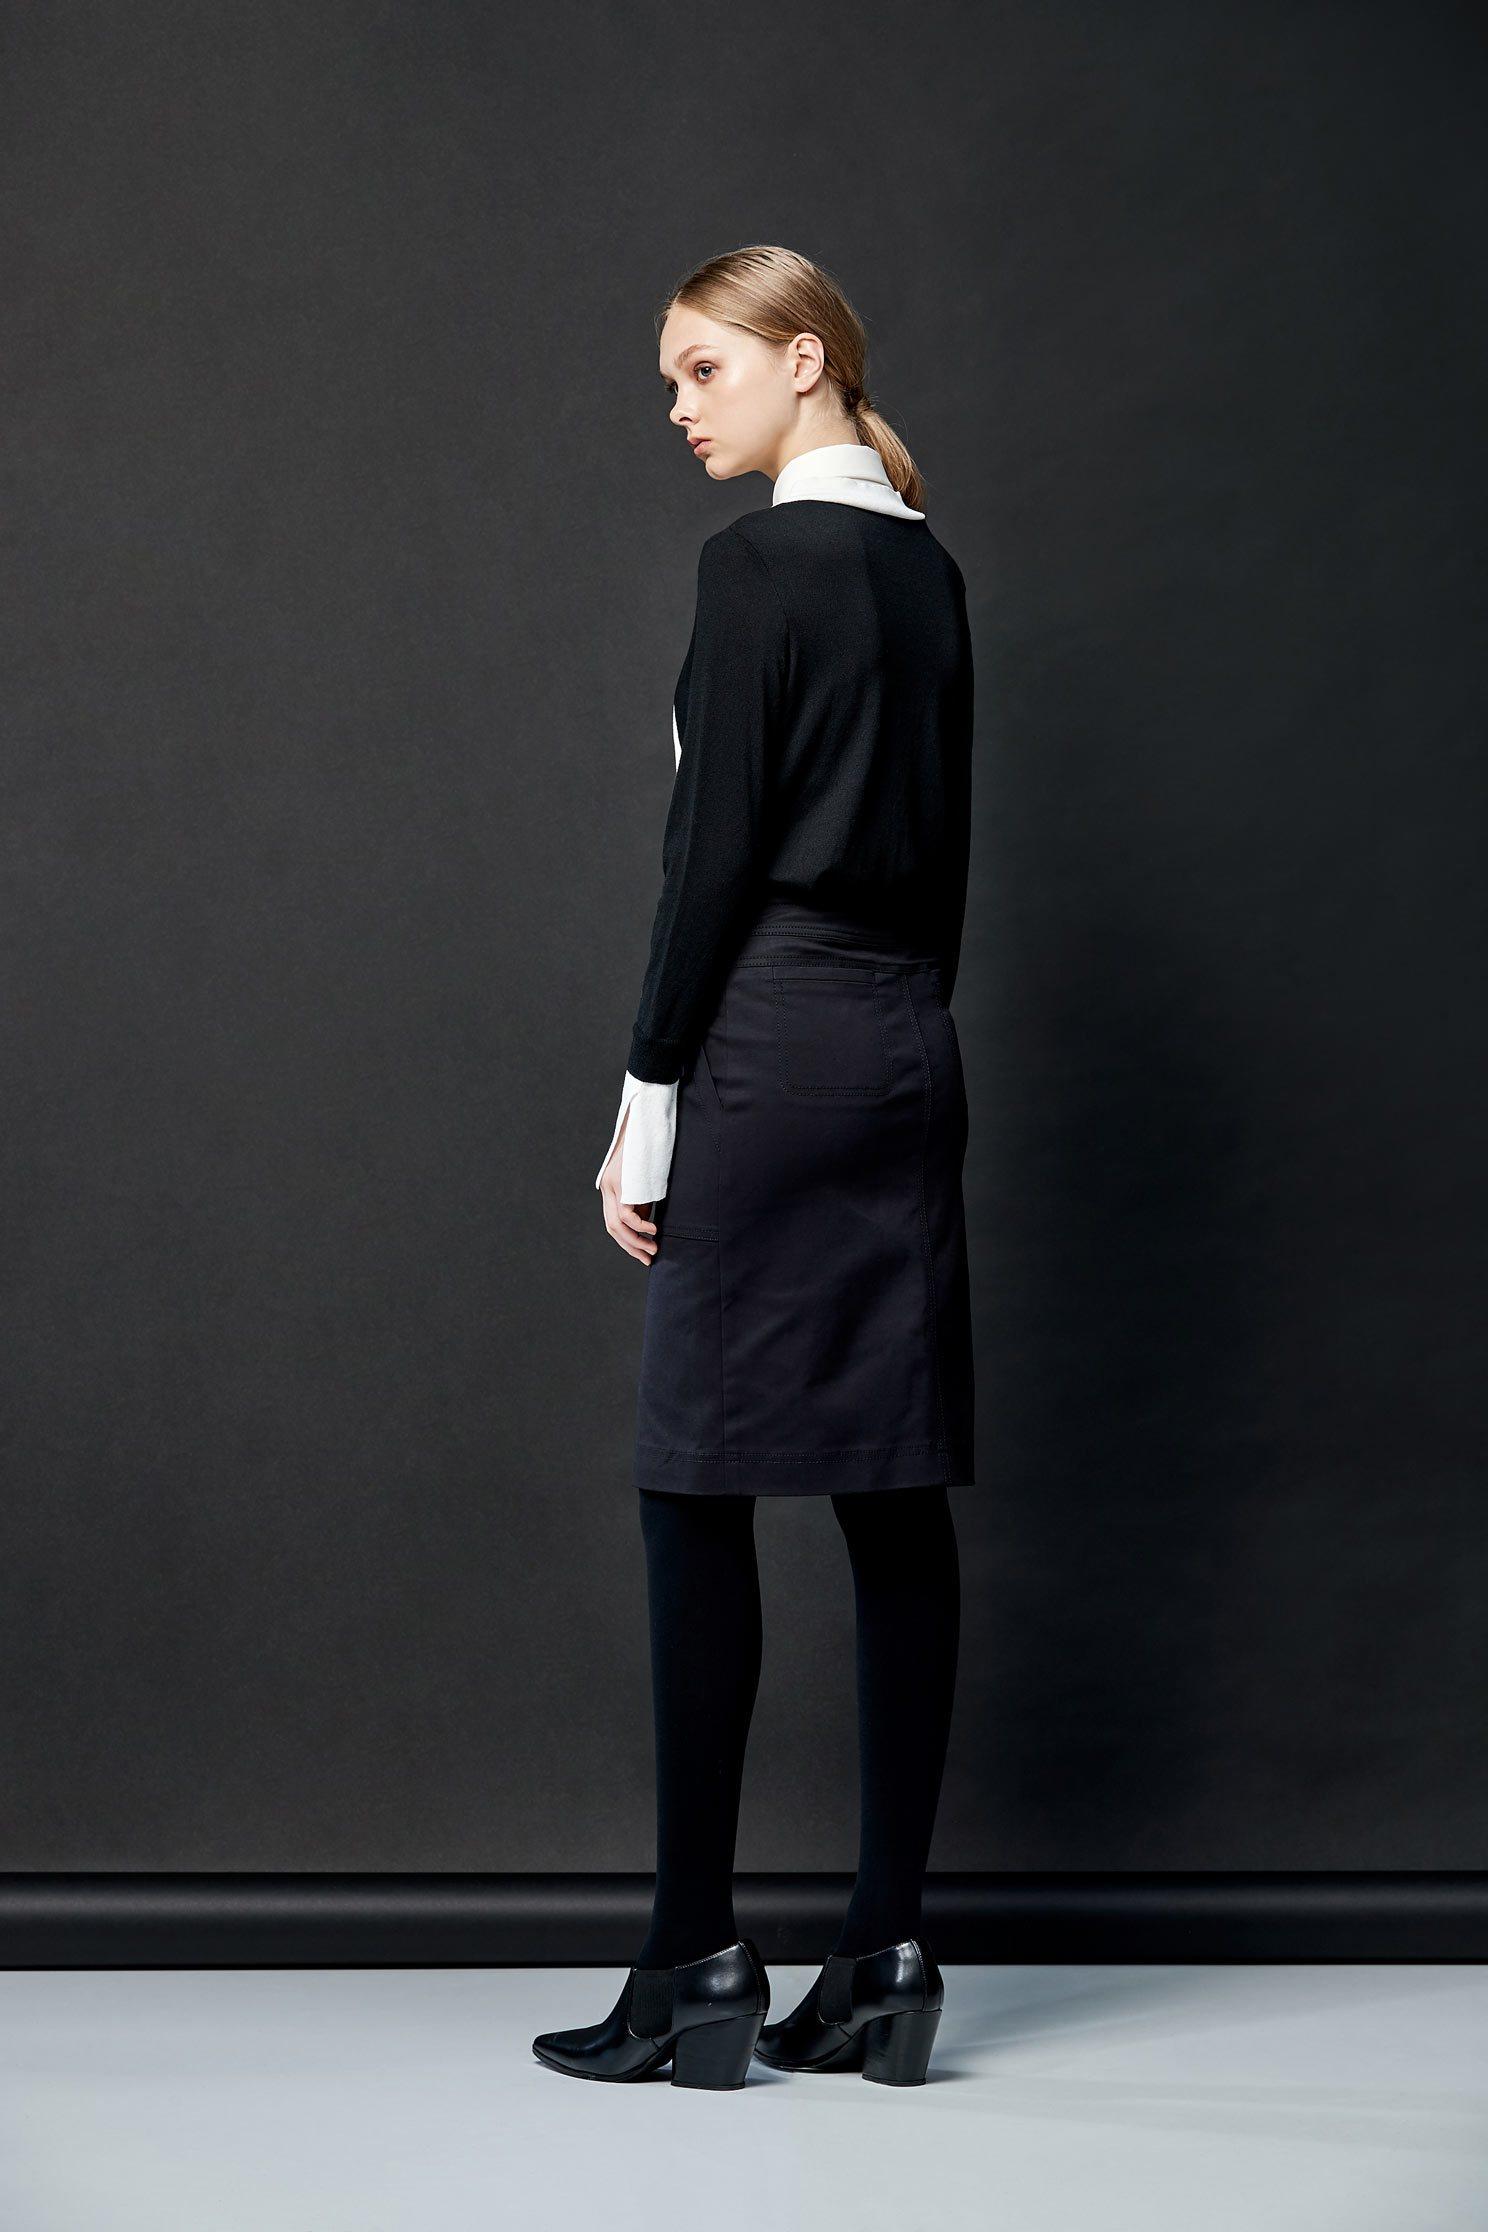 Black/white knitting shirt top,Top,Blouse,knitting,Knitted top,Knitted Top,長袖上衣